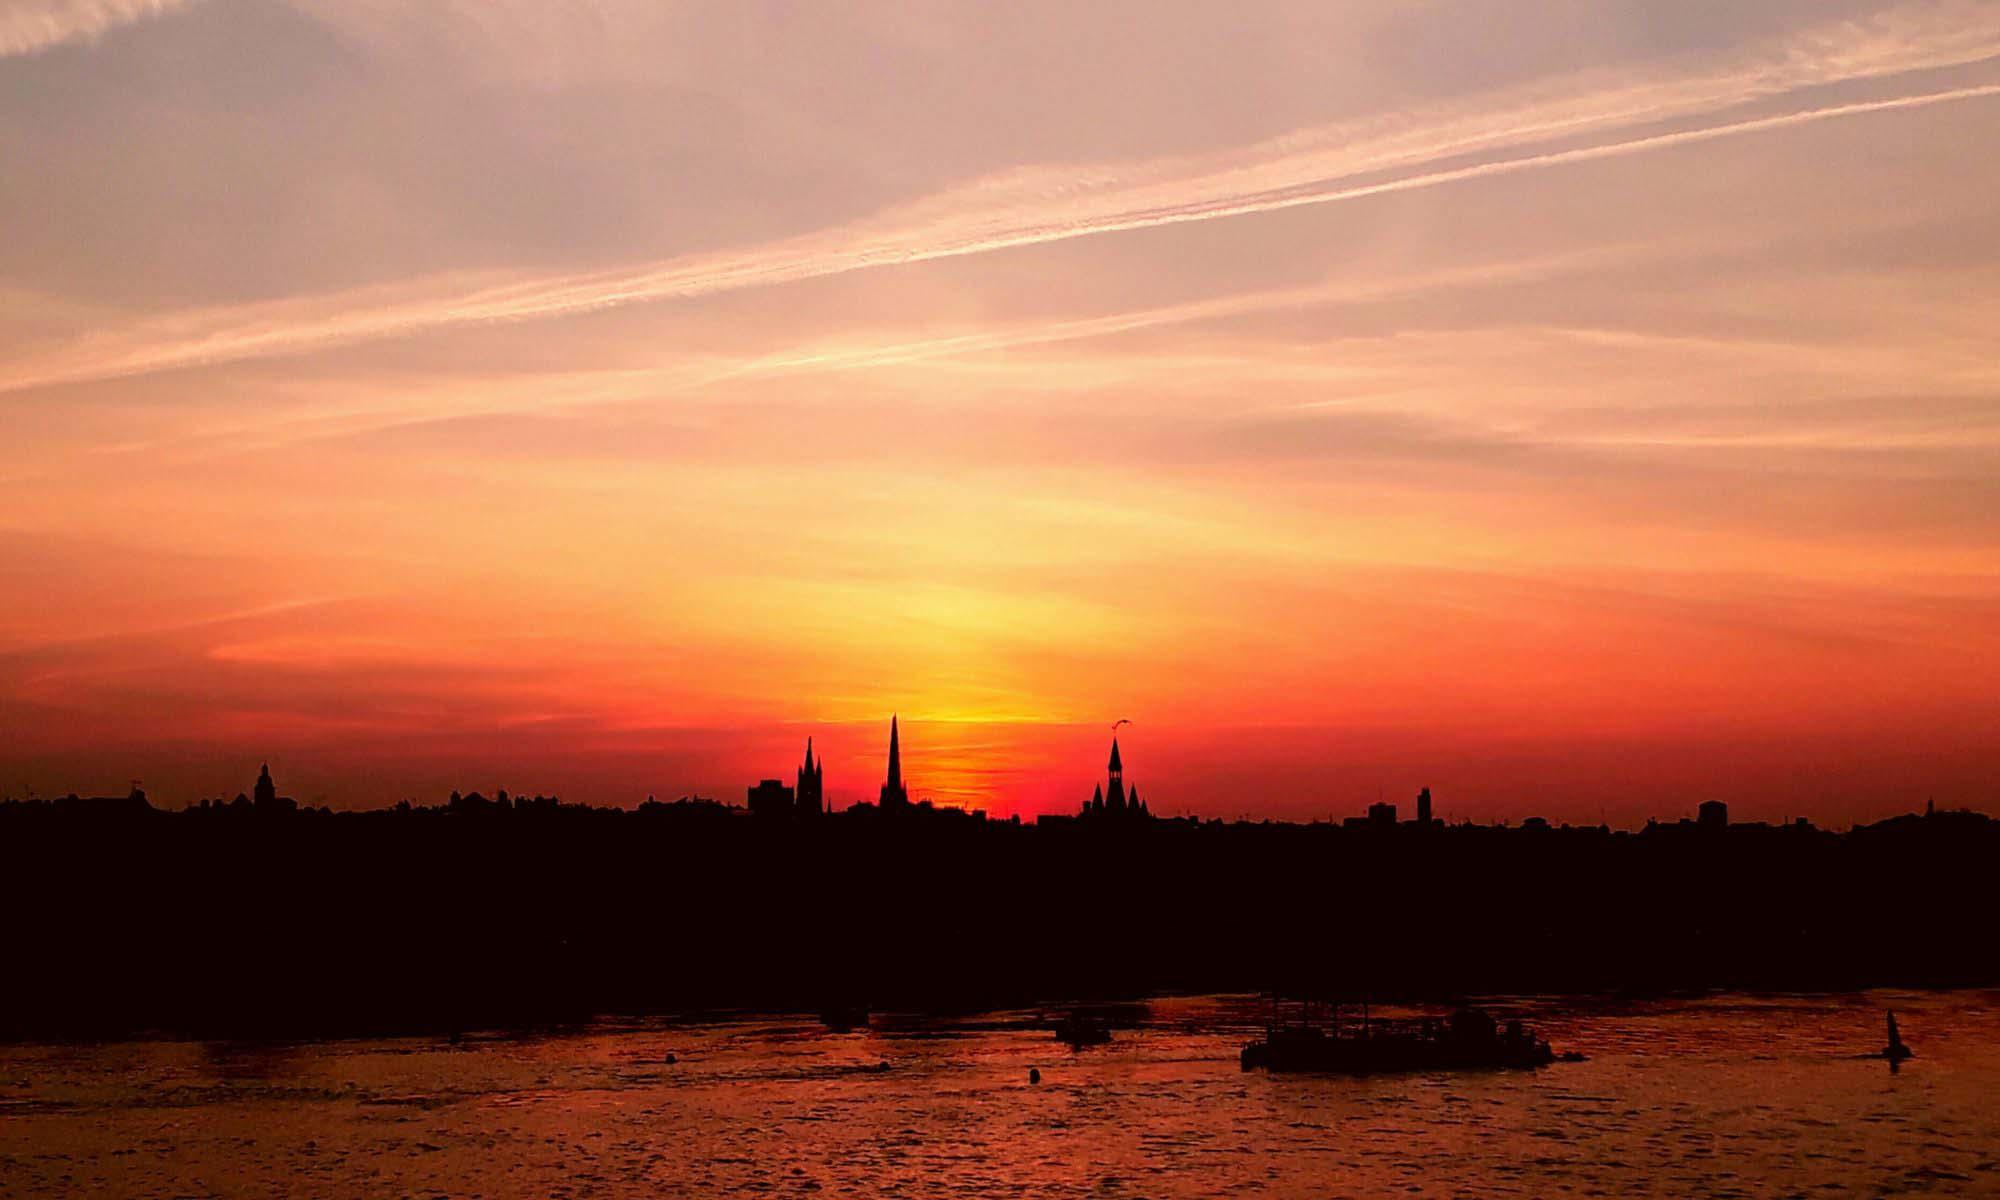 Sunset over Bordeaux